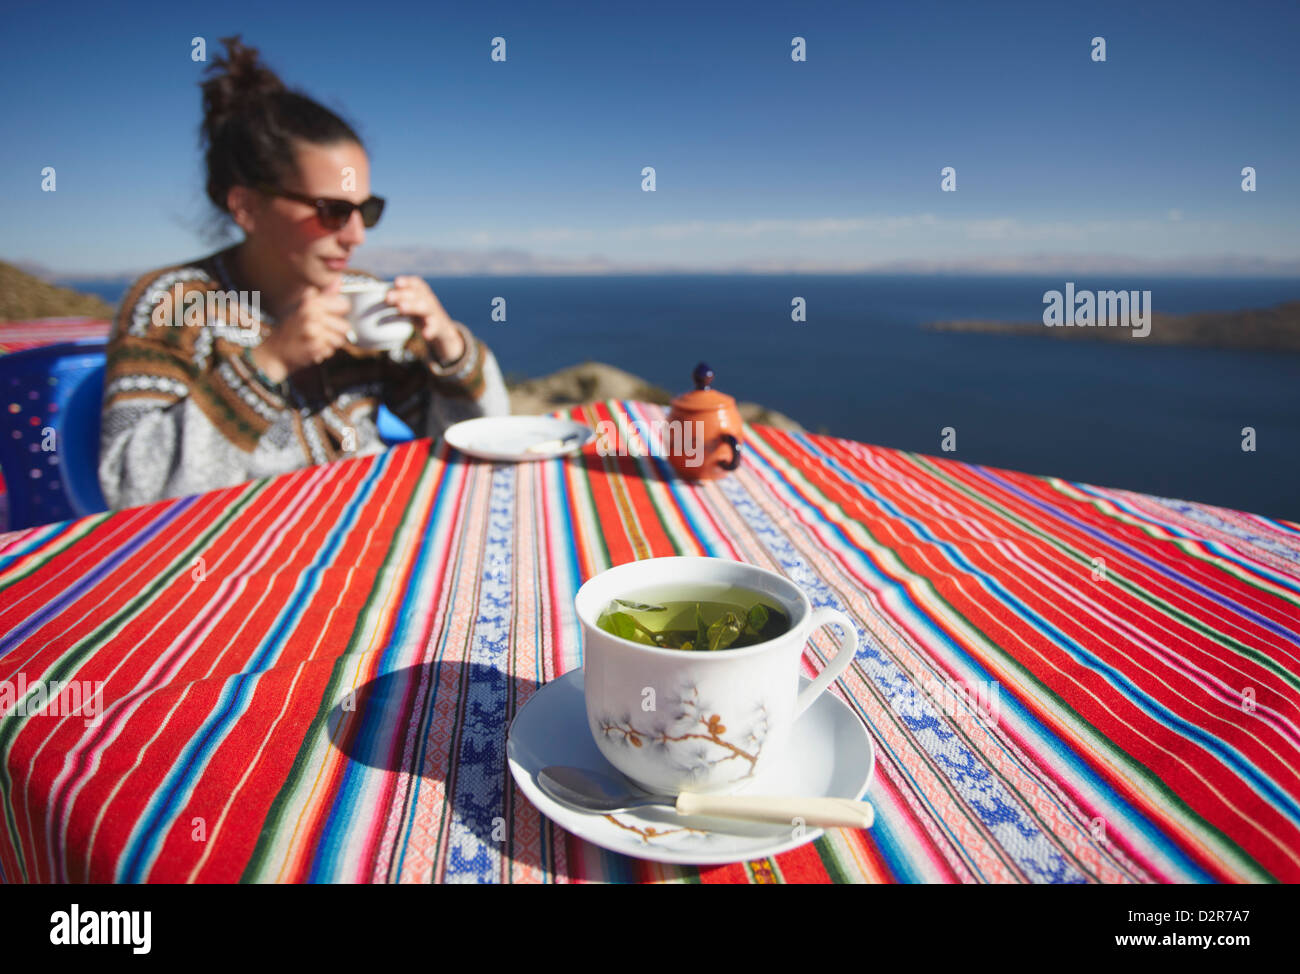 Cocoa leaf tea at outdoor cafe on Isla del Sol (Island of the Sun), Lake Titicaca, Bolivia, South America - Stock Image